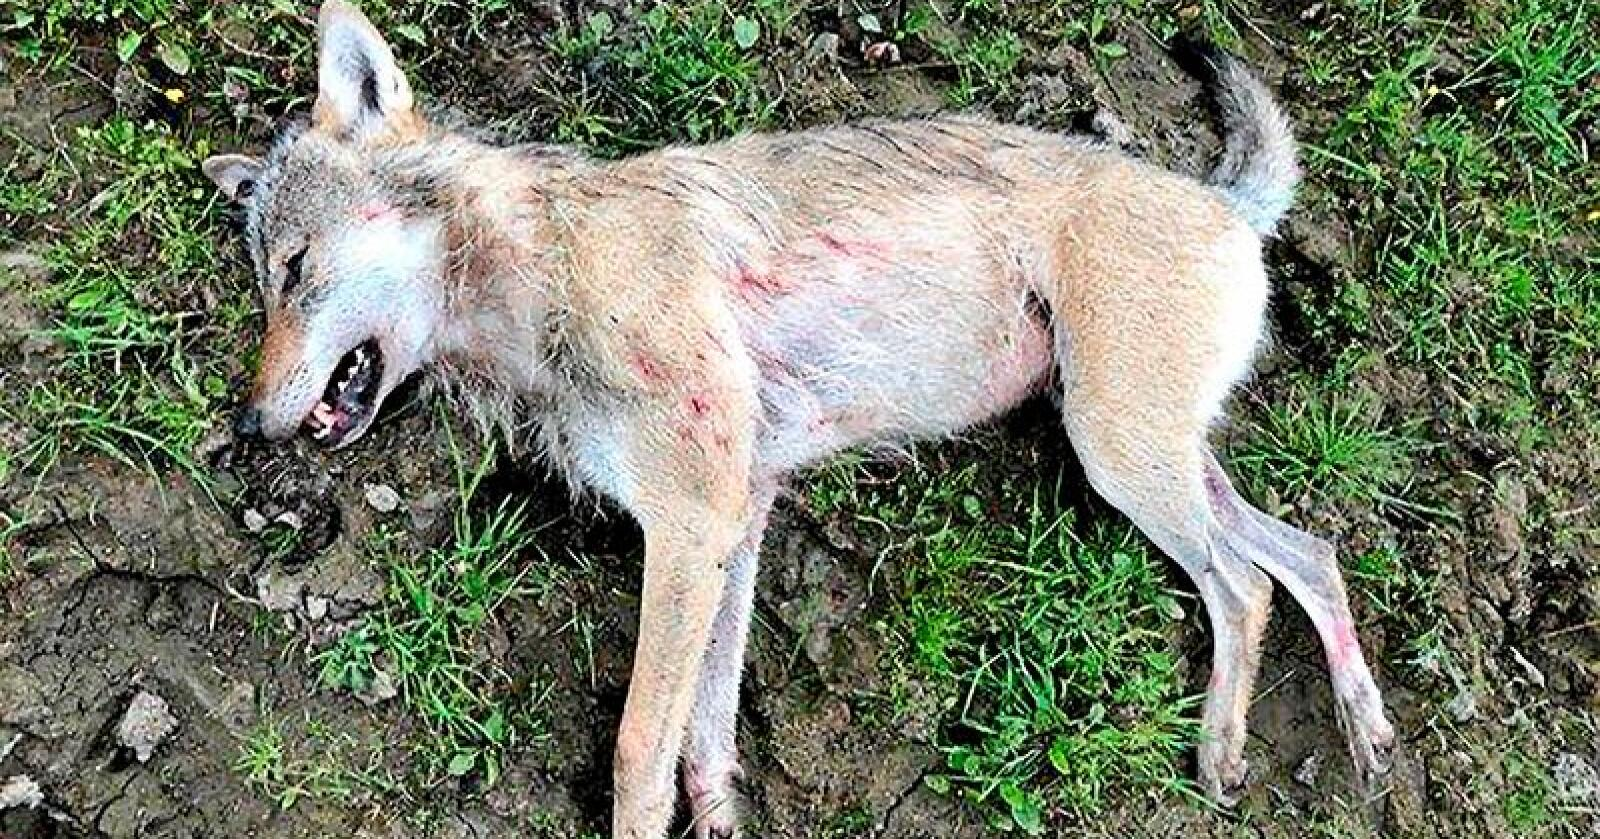 Ulven ble skutt på et beite i Sør-Odal. Foto: Politiet / NTB scanpix